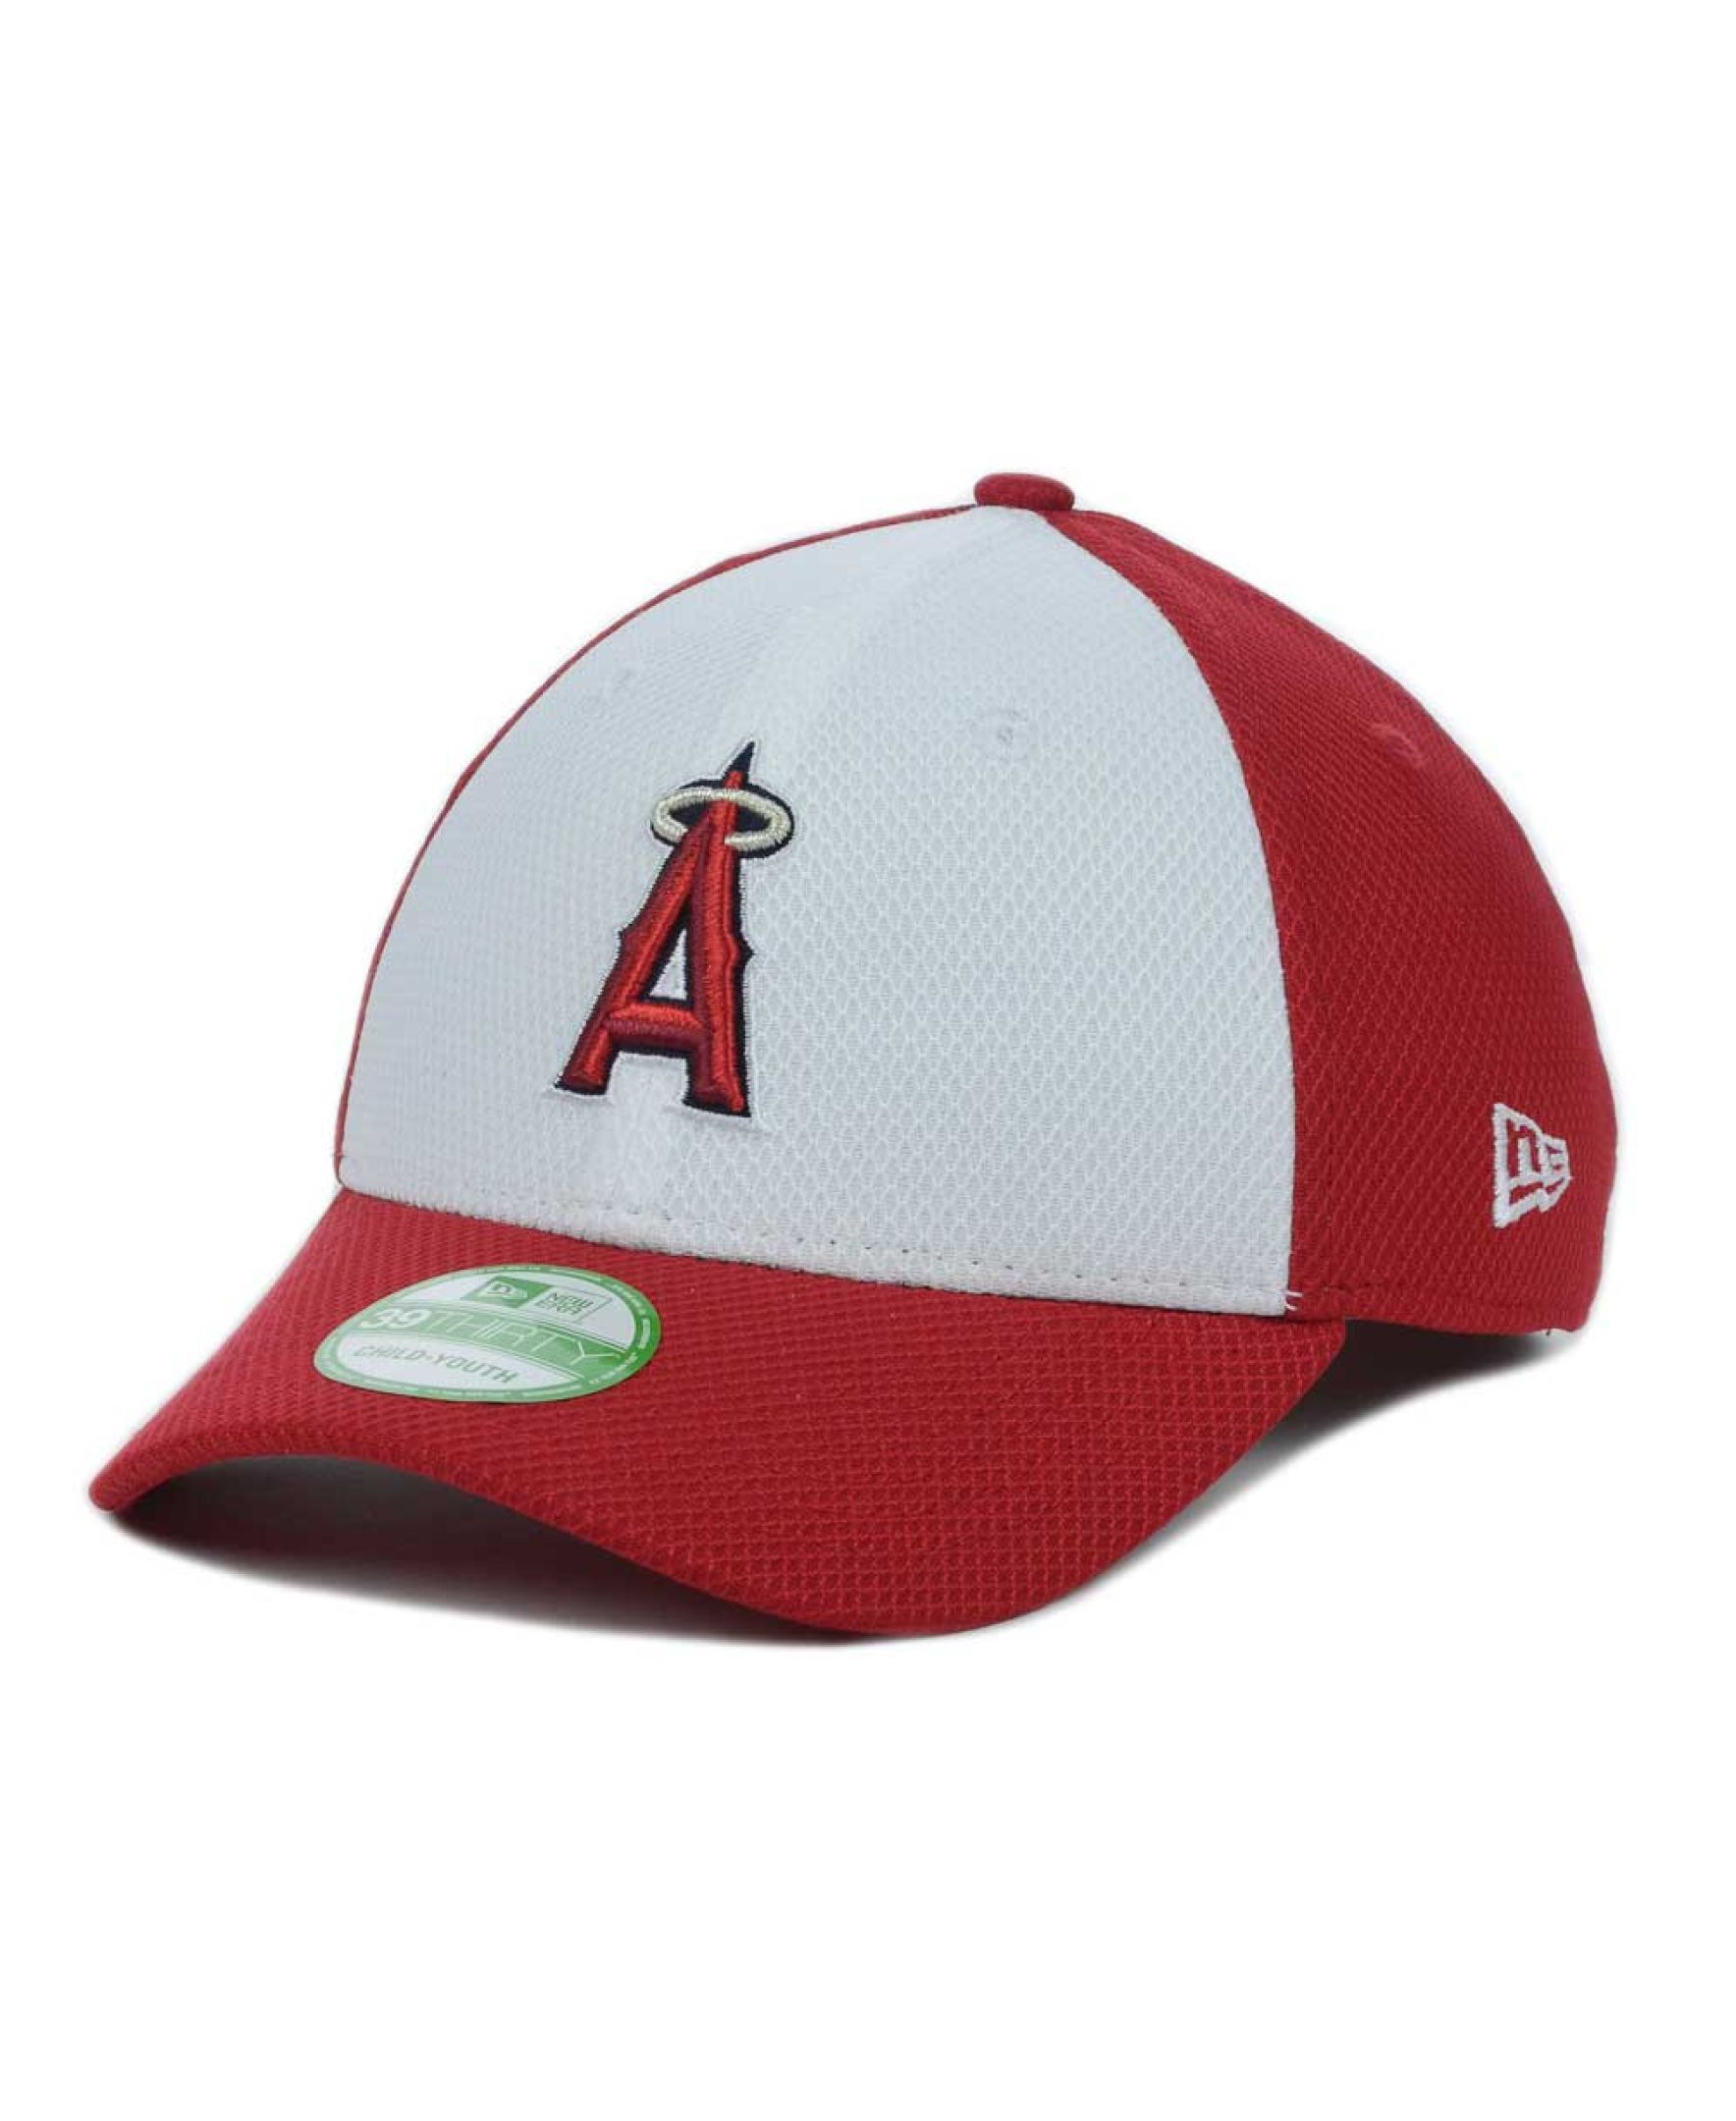 buy popular 5da5d 97d57 New Era Kids  Los Angeles Angels of Anaheim Diamond Era 39THIRTY Cap